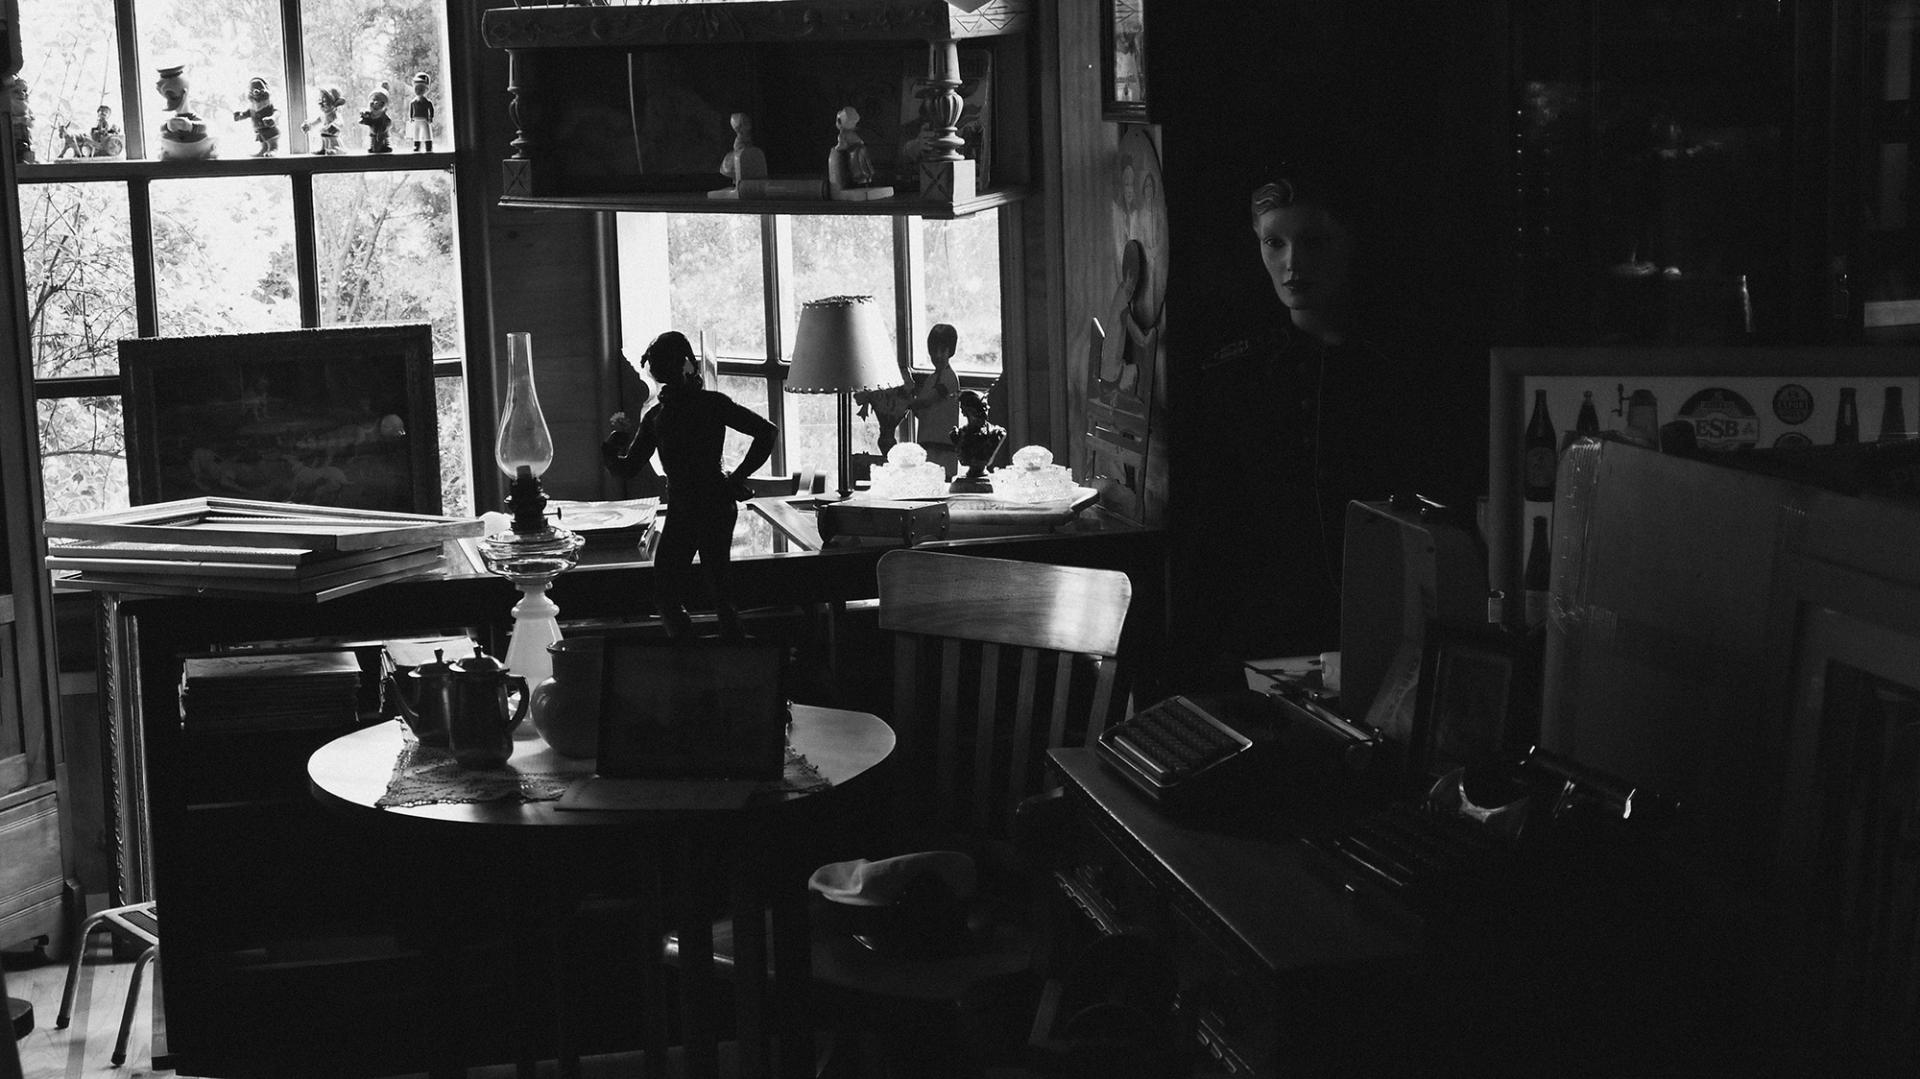 HORACIO LORENTE — Art Director SERIES 1 / PATAGONIA